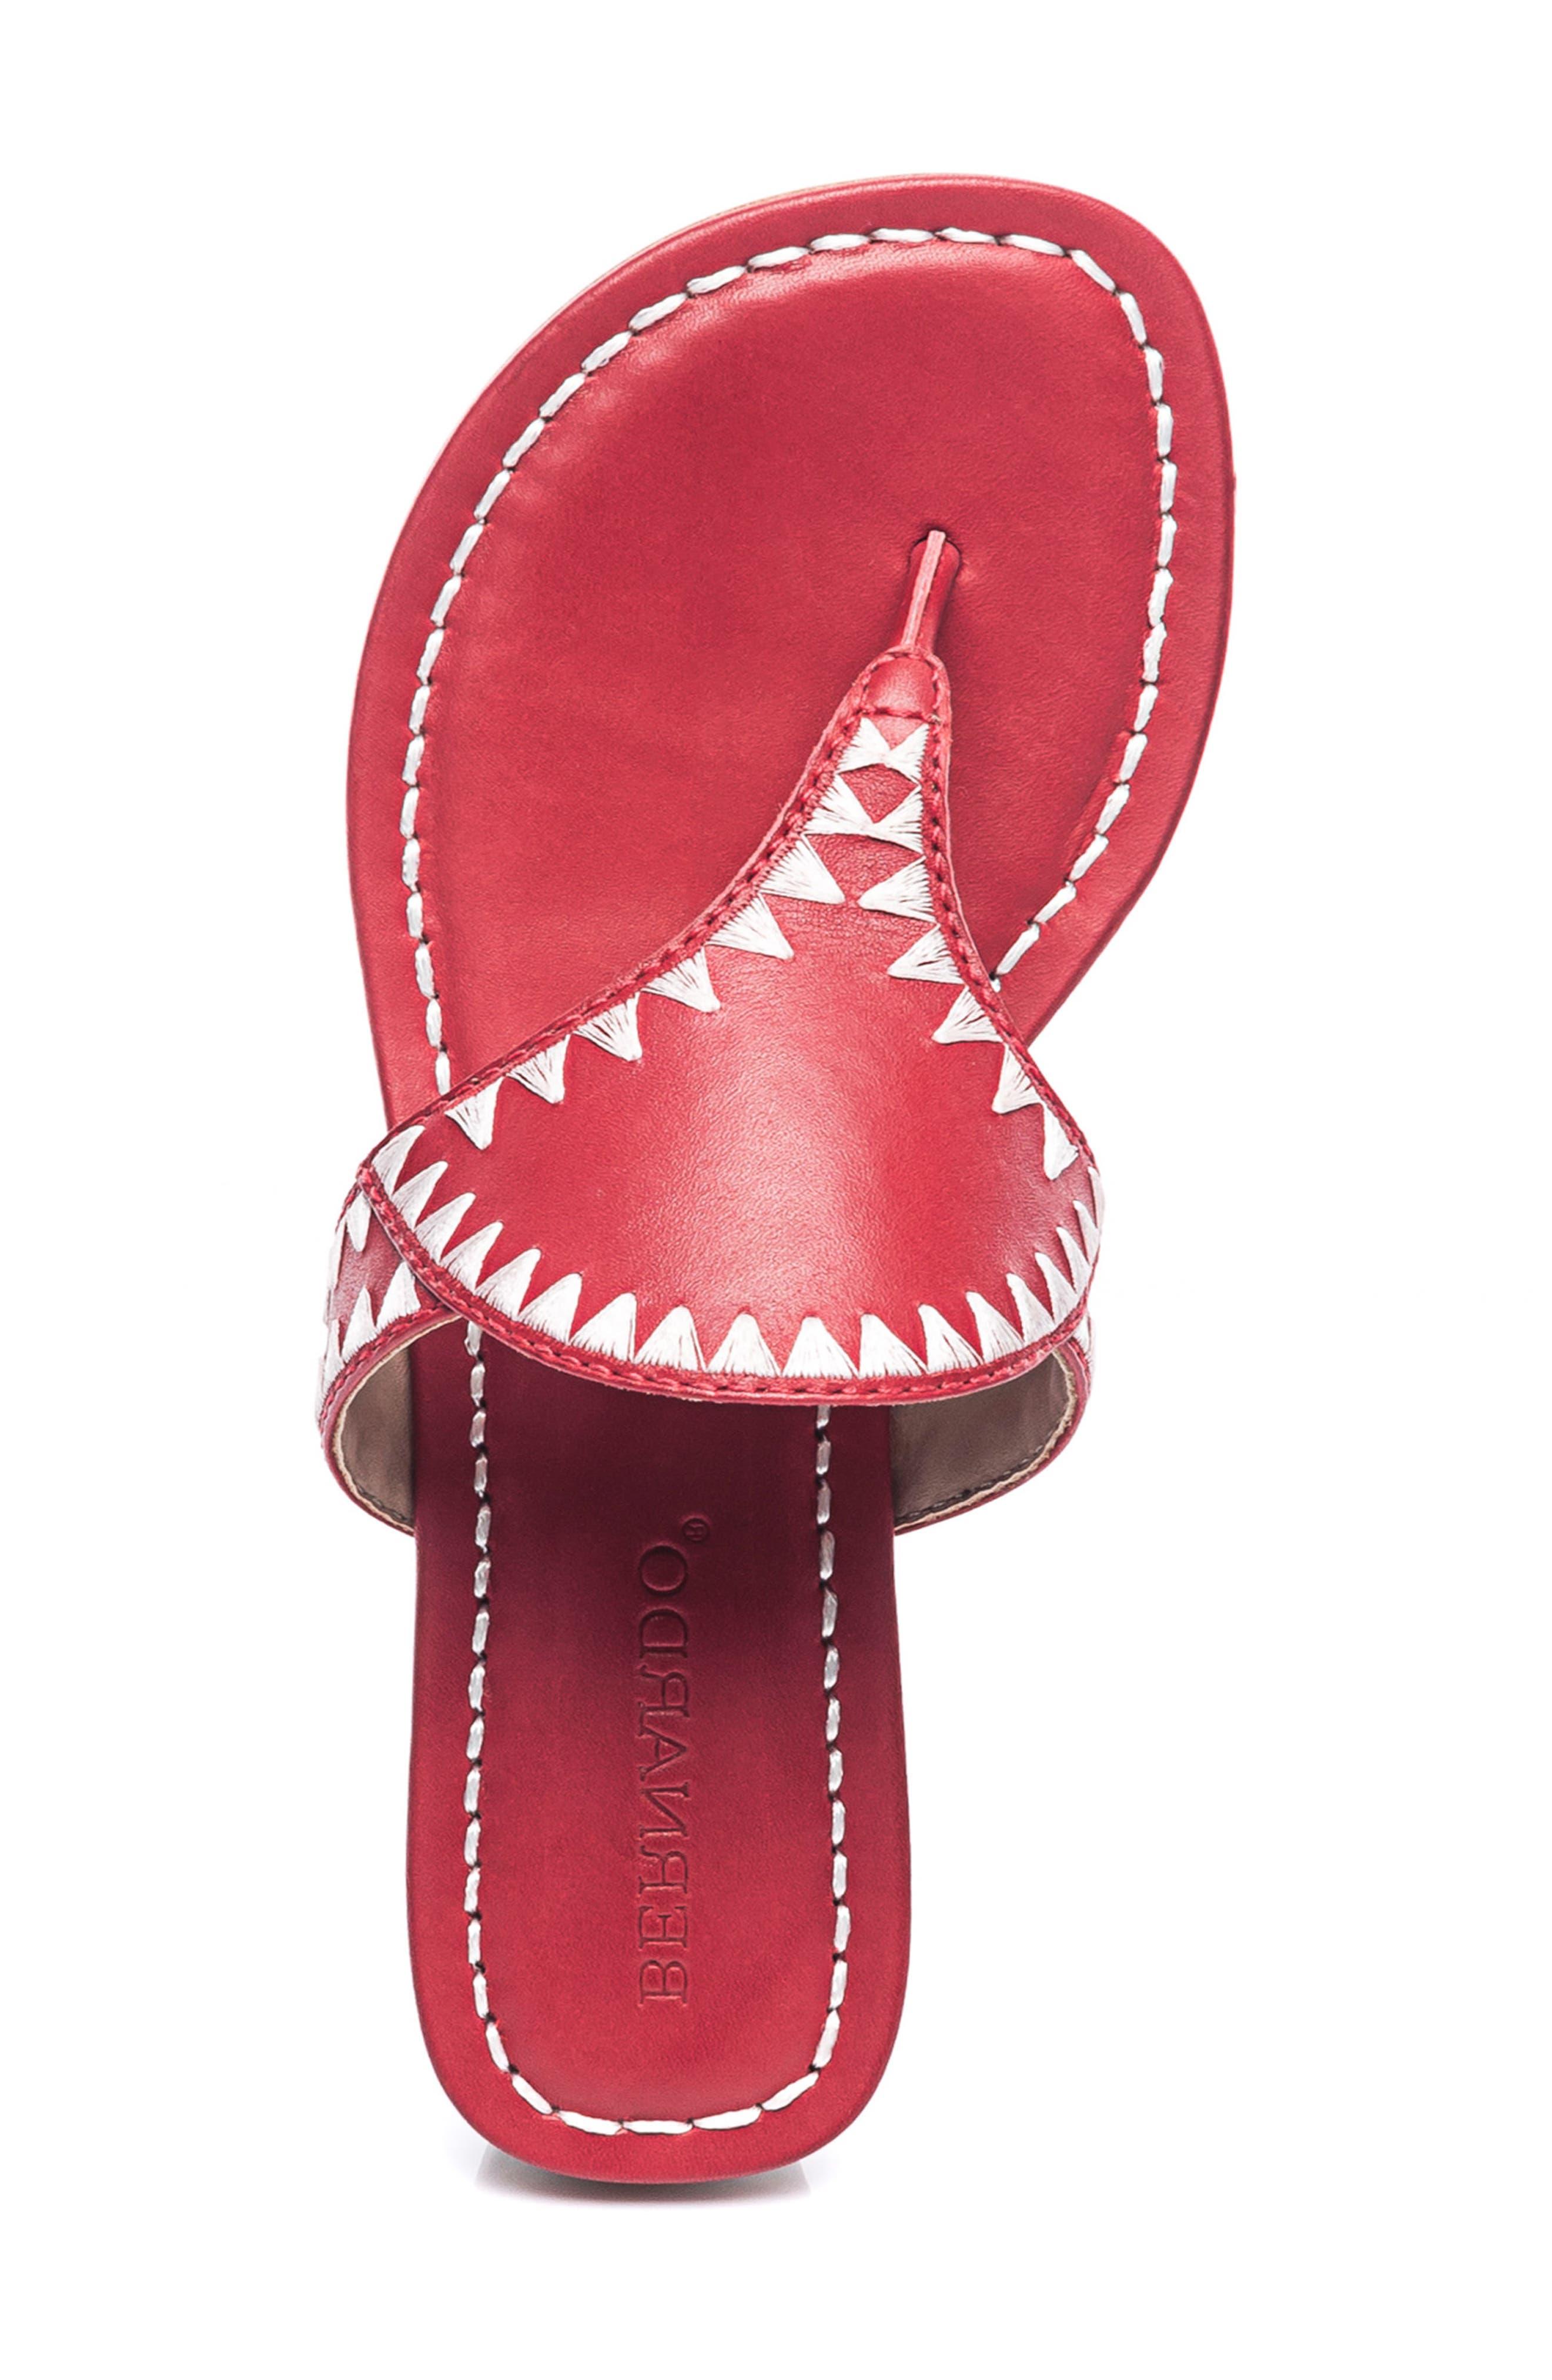 Bernardo Gabi Embroidered Sandal,                             Alternate thumbnail 5, color,                             RED LEATHER